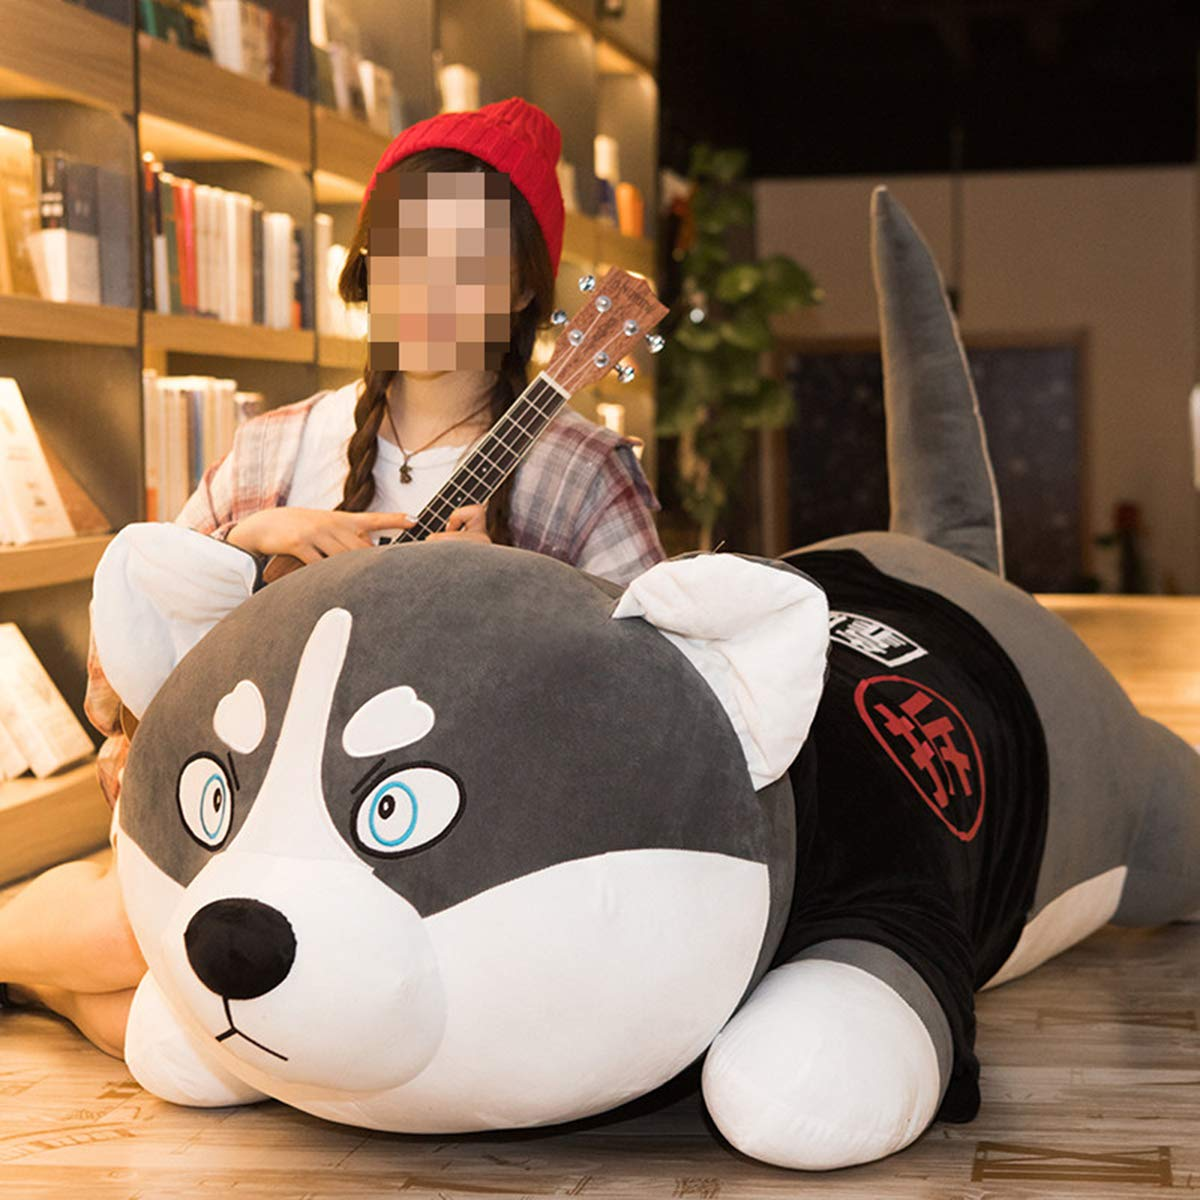 2 80cm Boy and Girl Soft Siberian Husky Boy Toy Dog Sleeping Pillow Holiday Gift Birthday Present